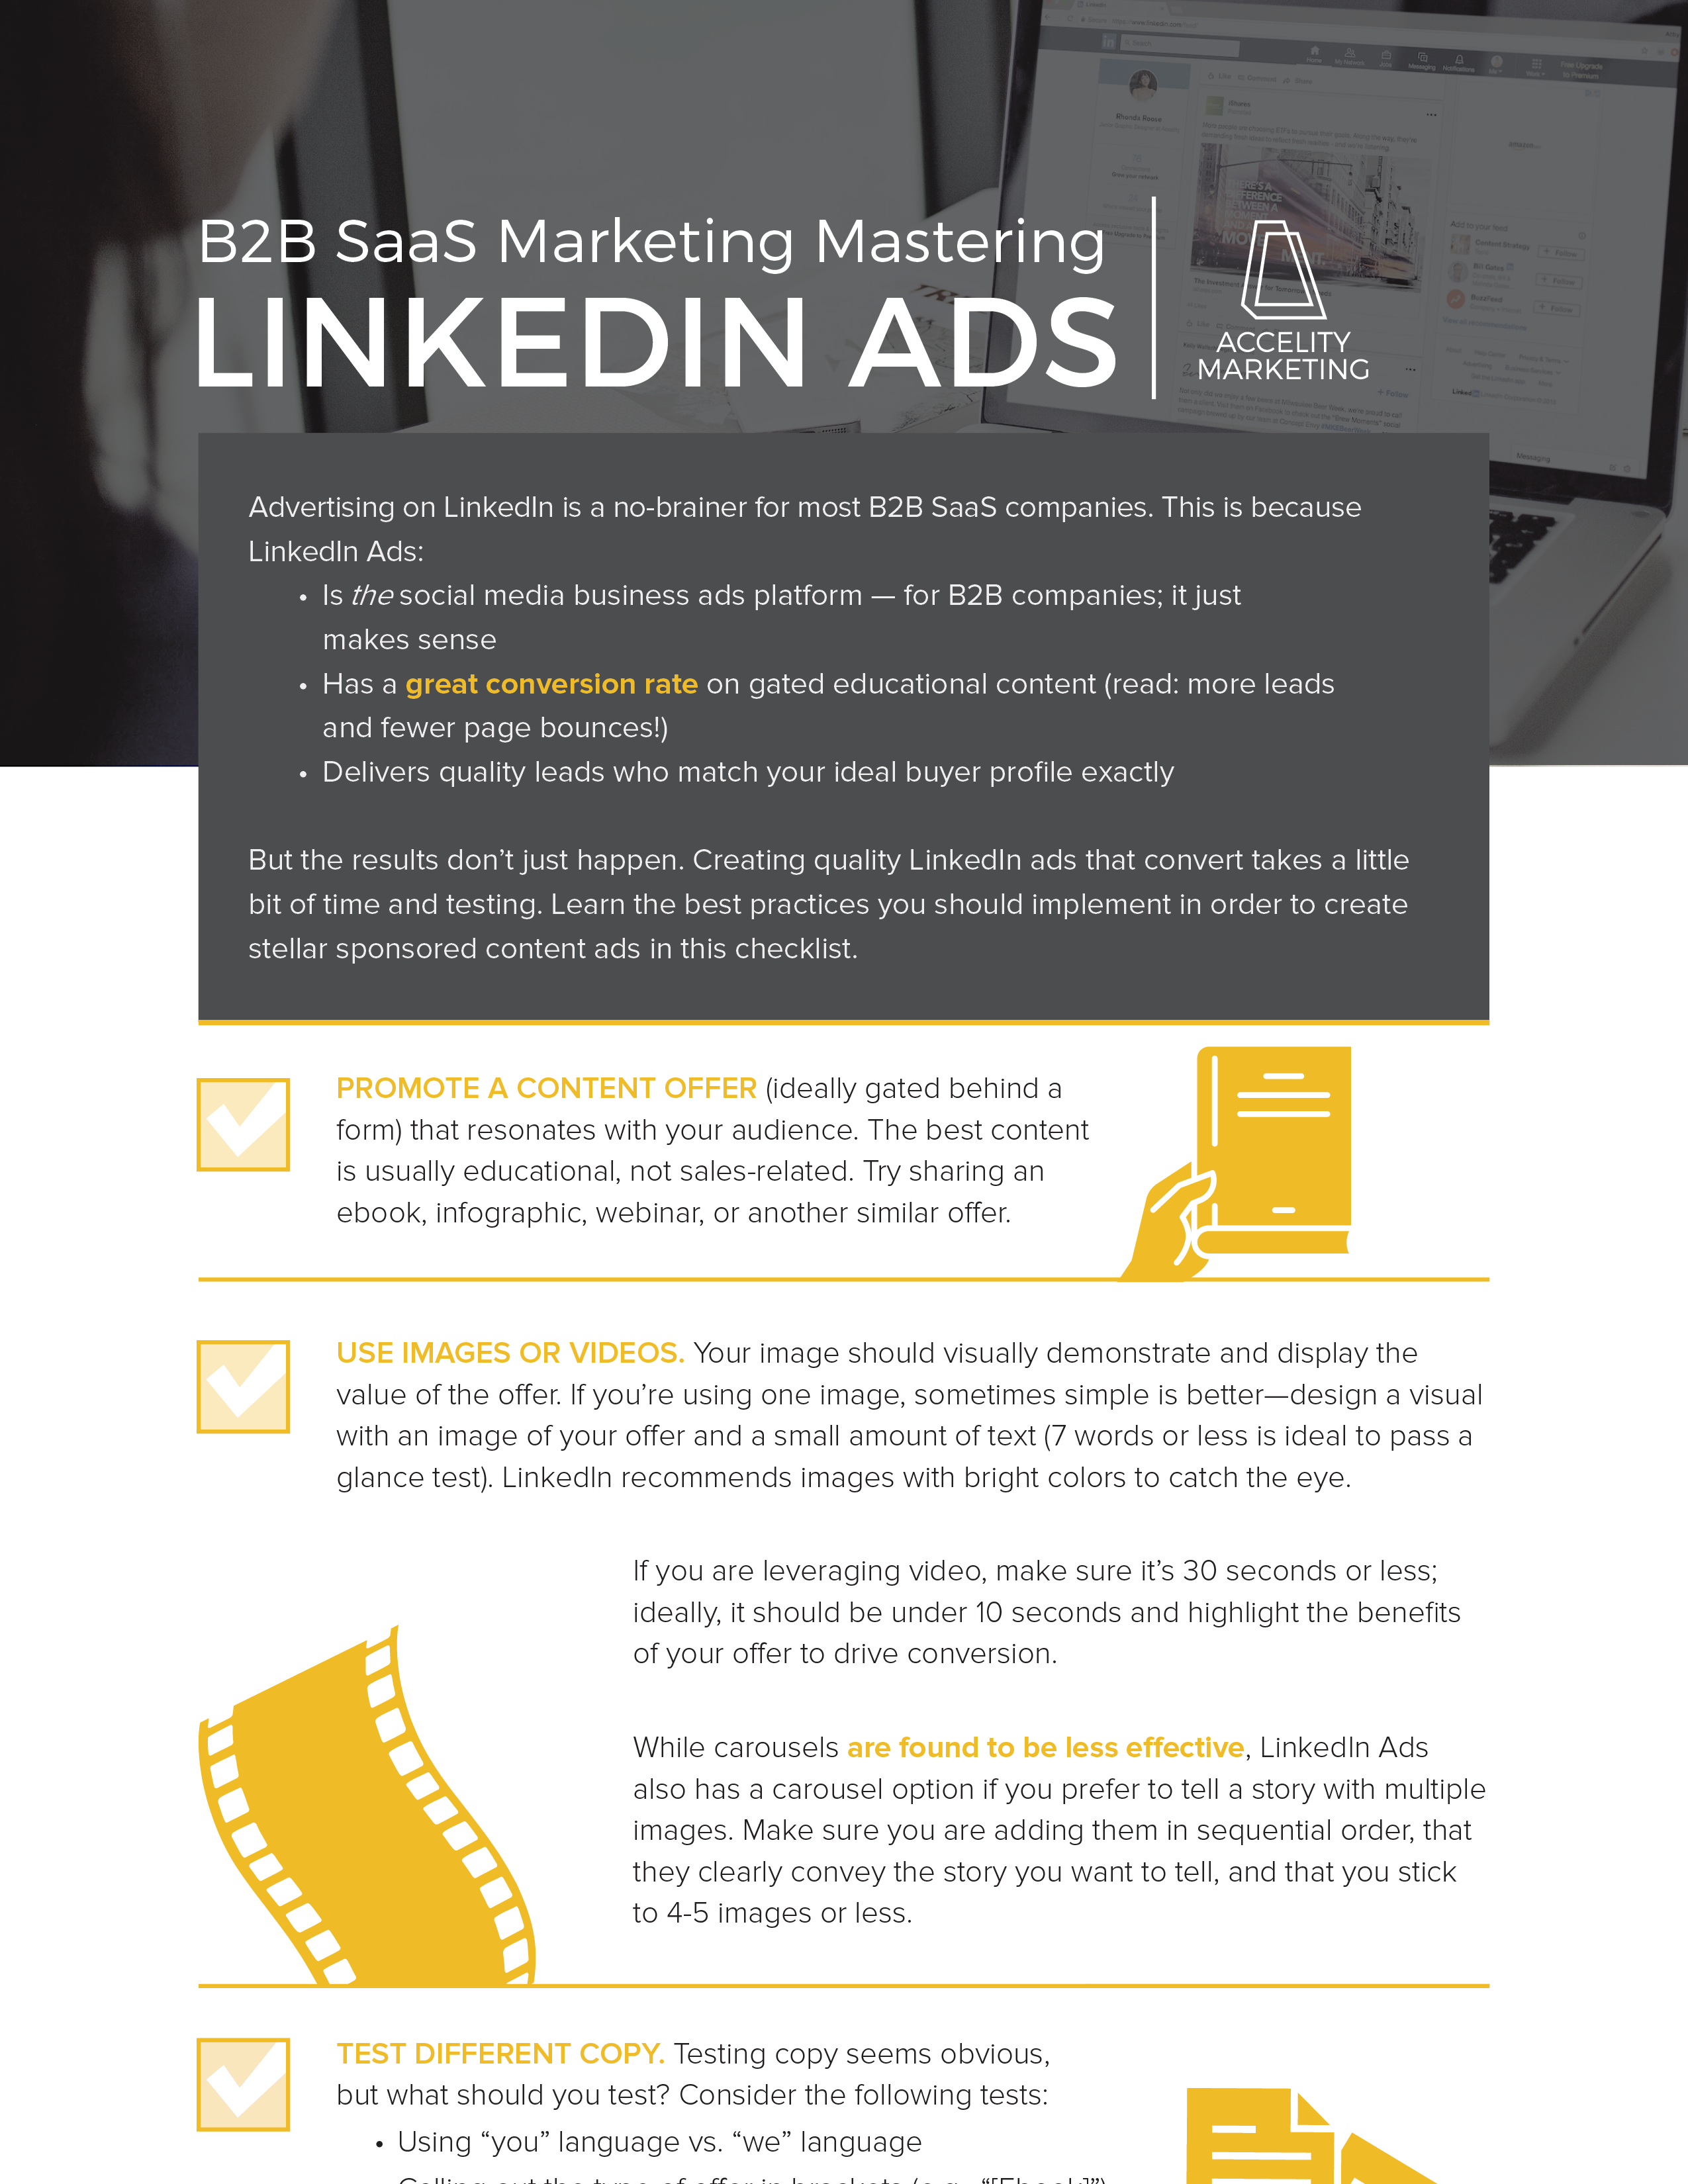 B2B SaaS Mkt: Mastering LinkedIn Ads